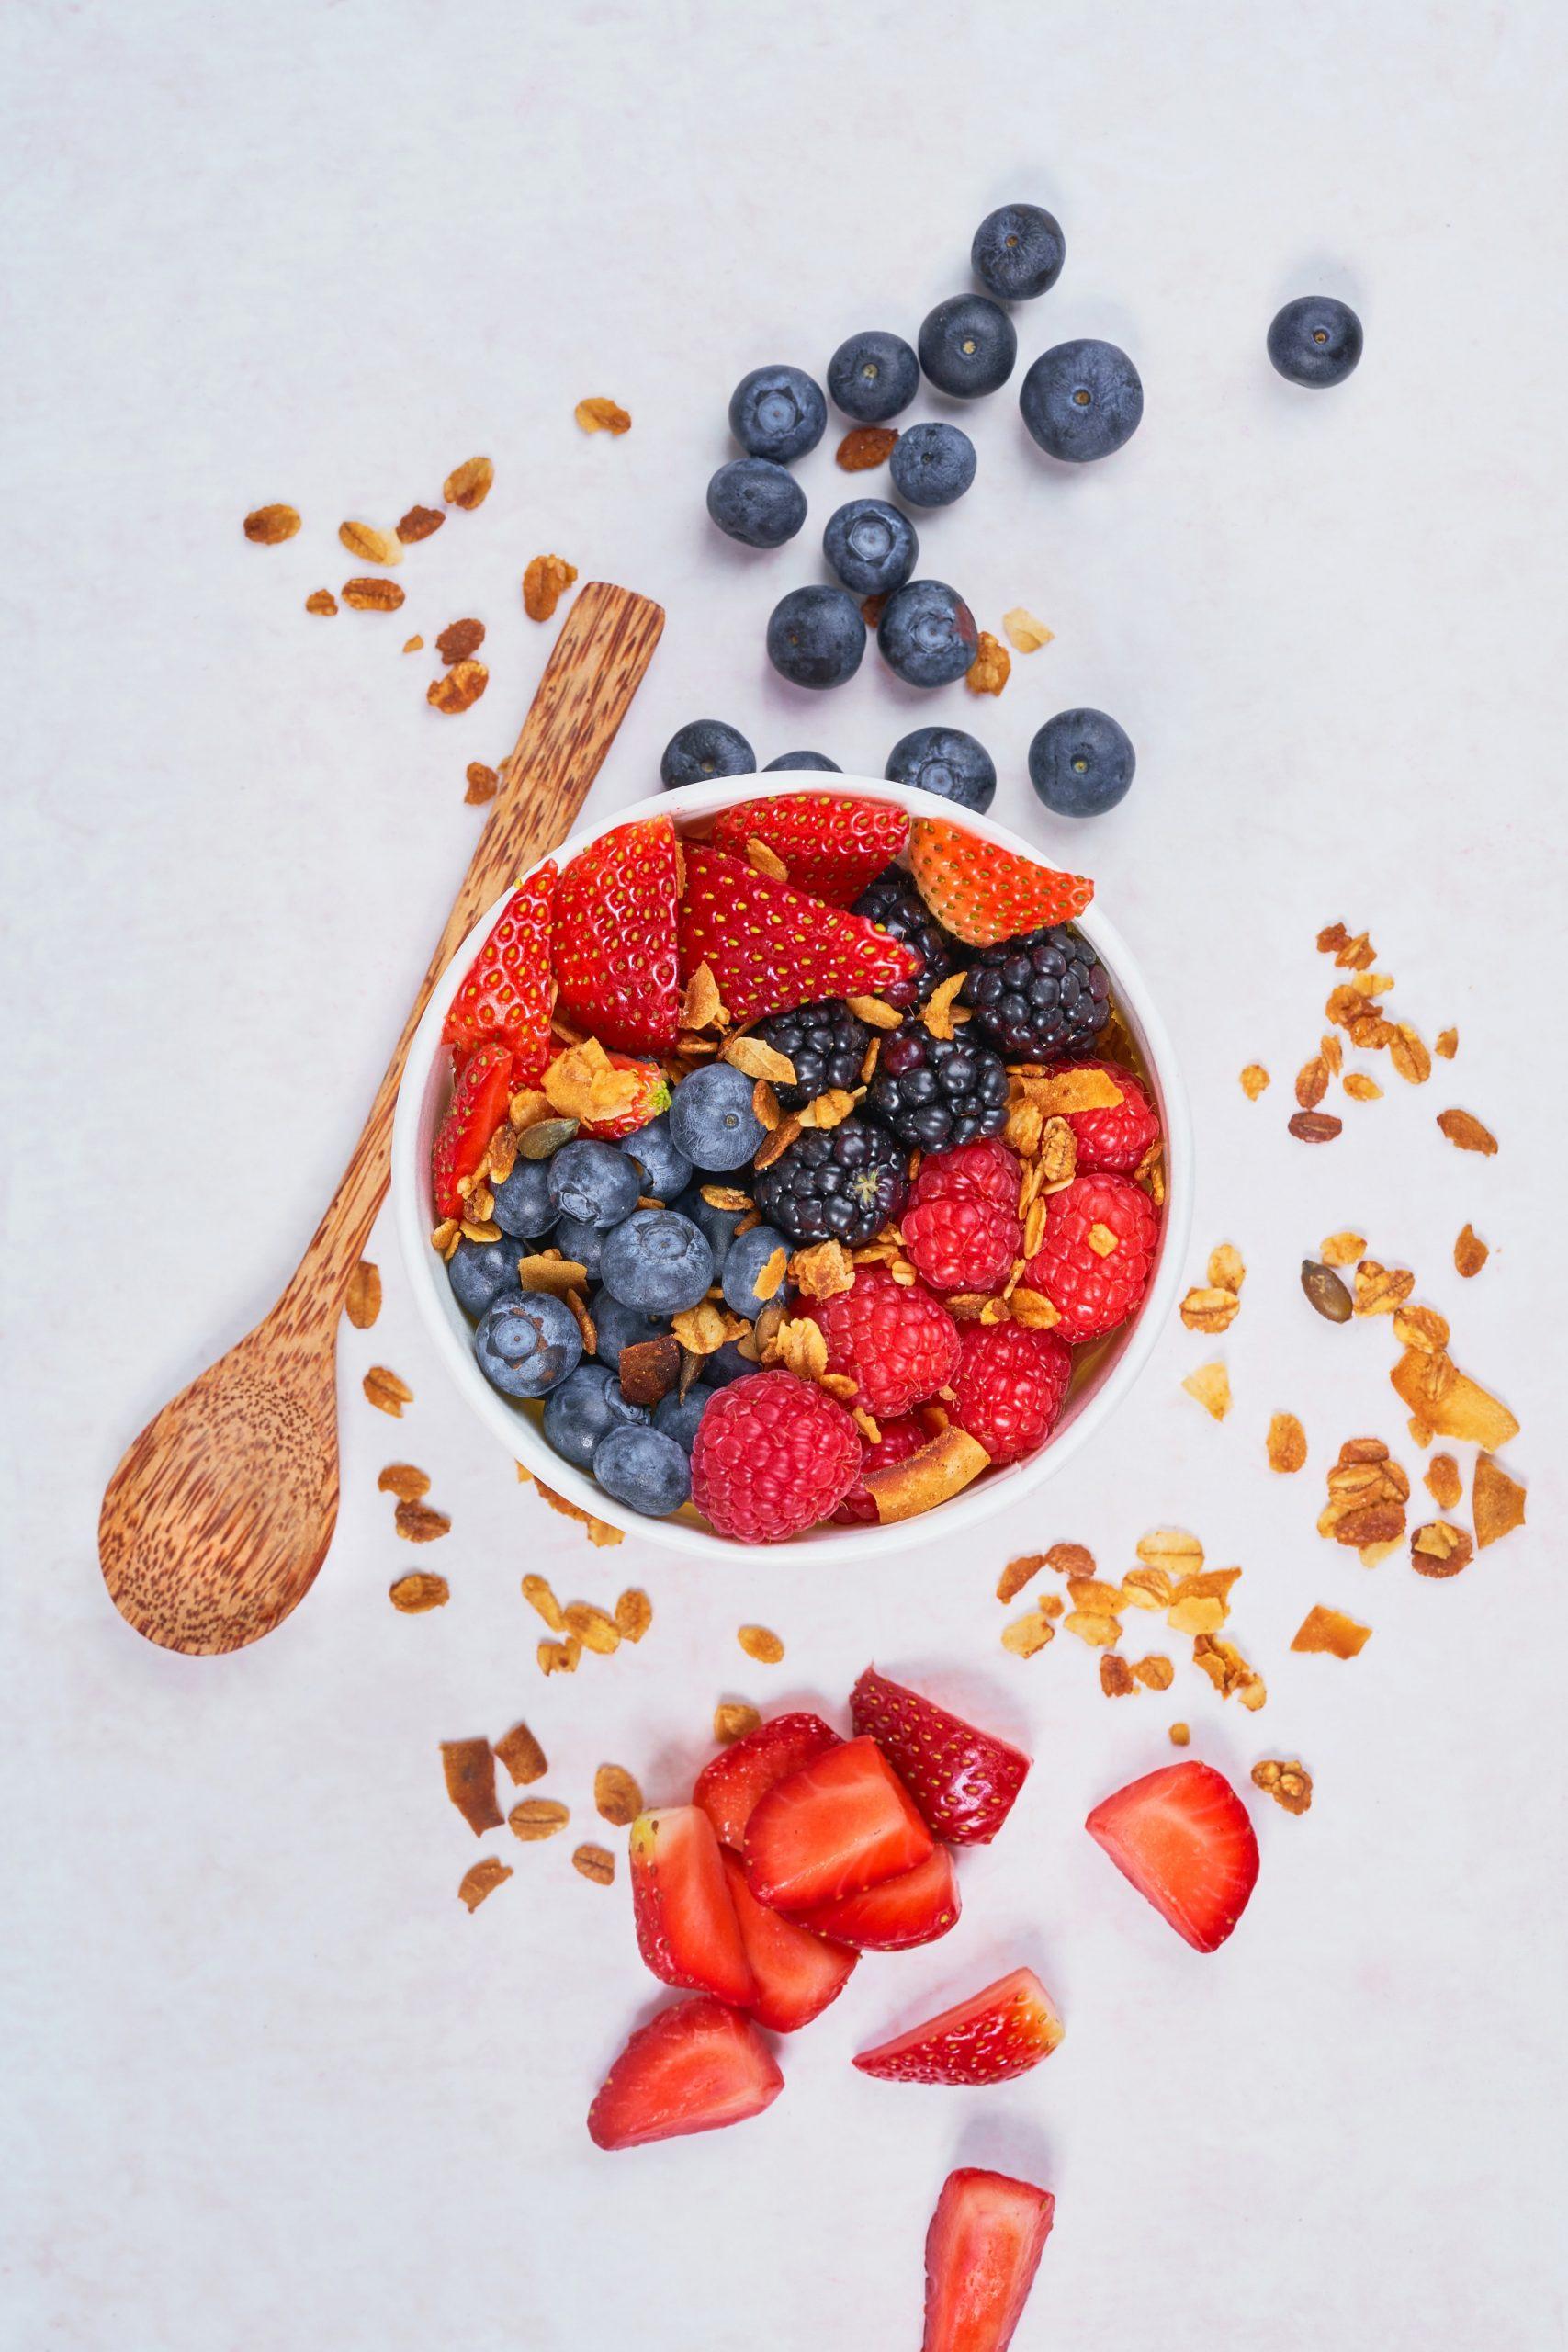 Berries - Heart Healthy Superfoods